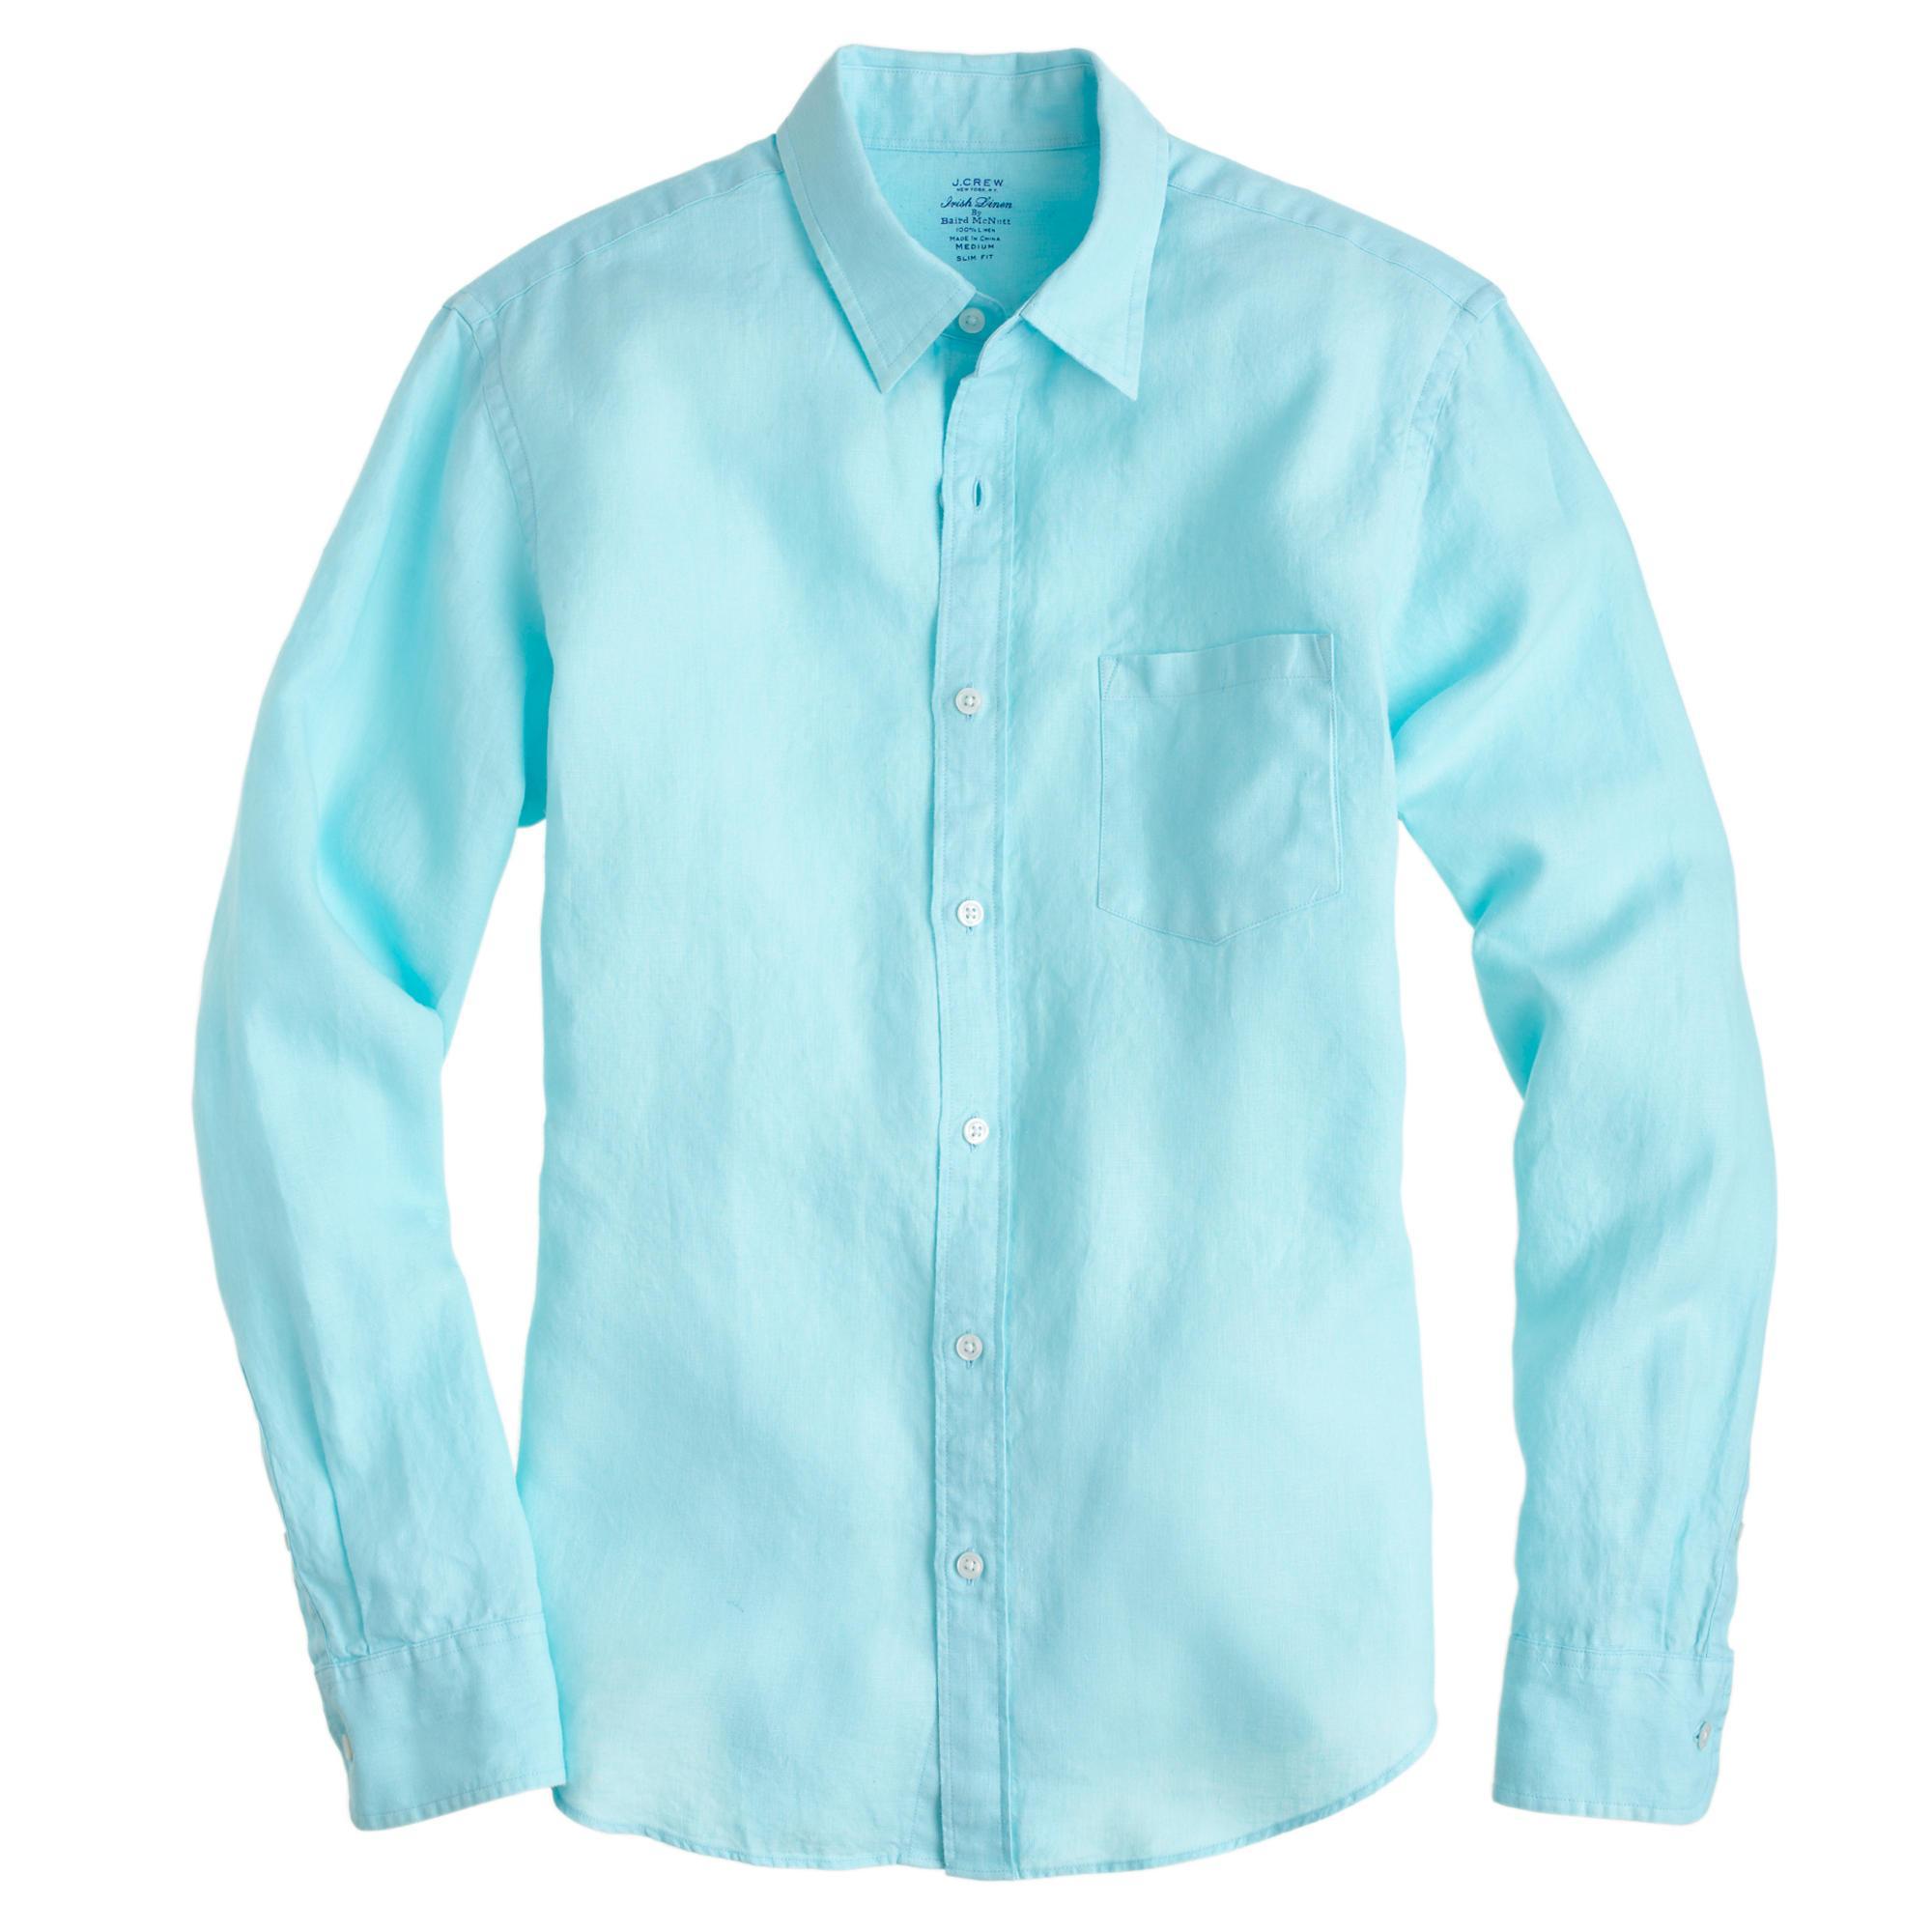 Lyst j crew irish linen shirt in blue for men for Irish linen dress shirts